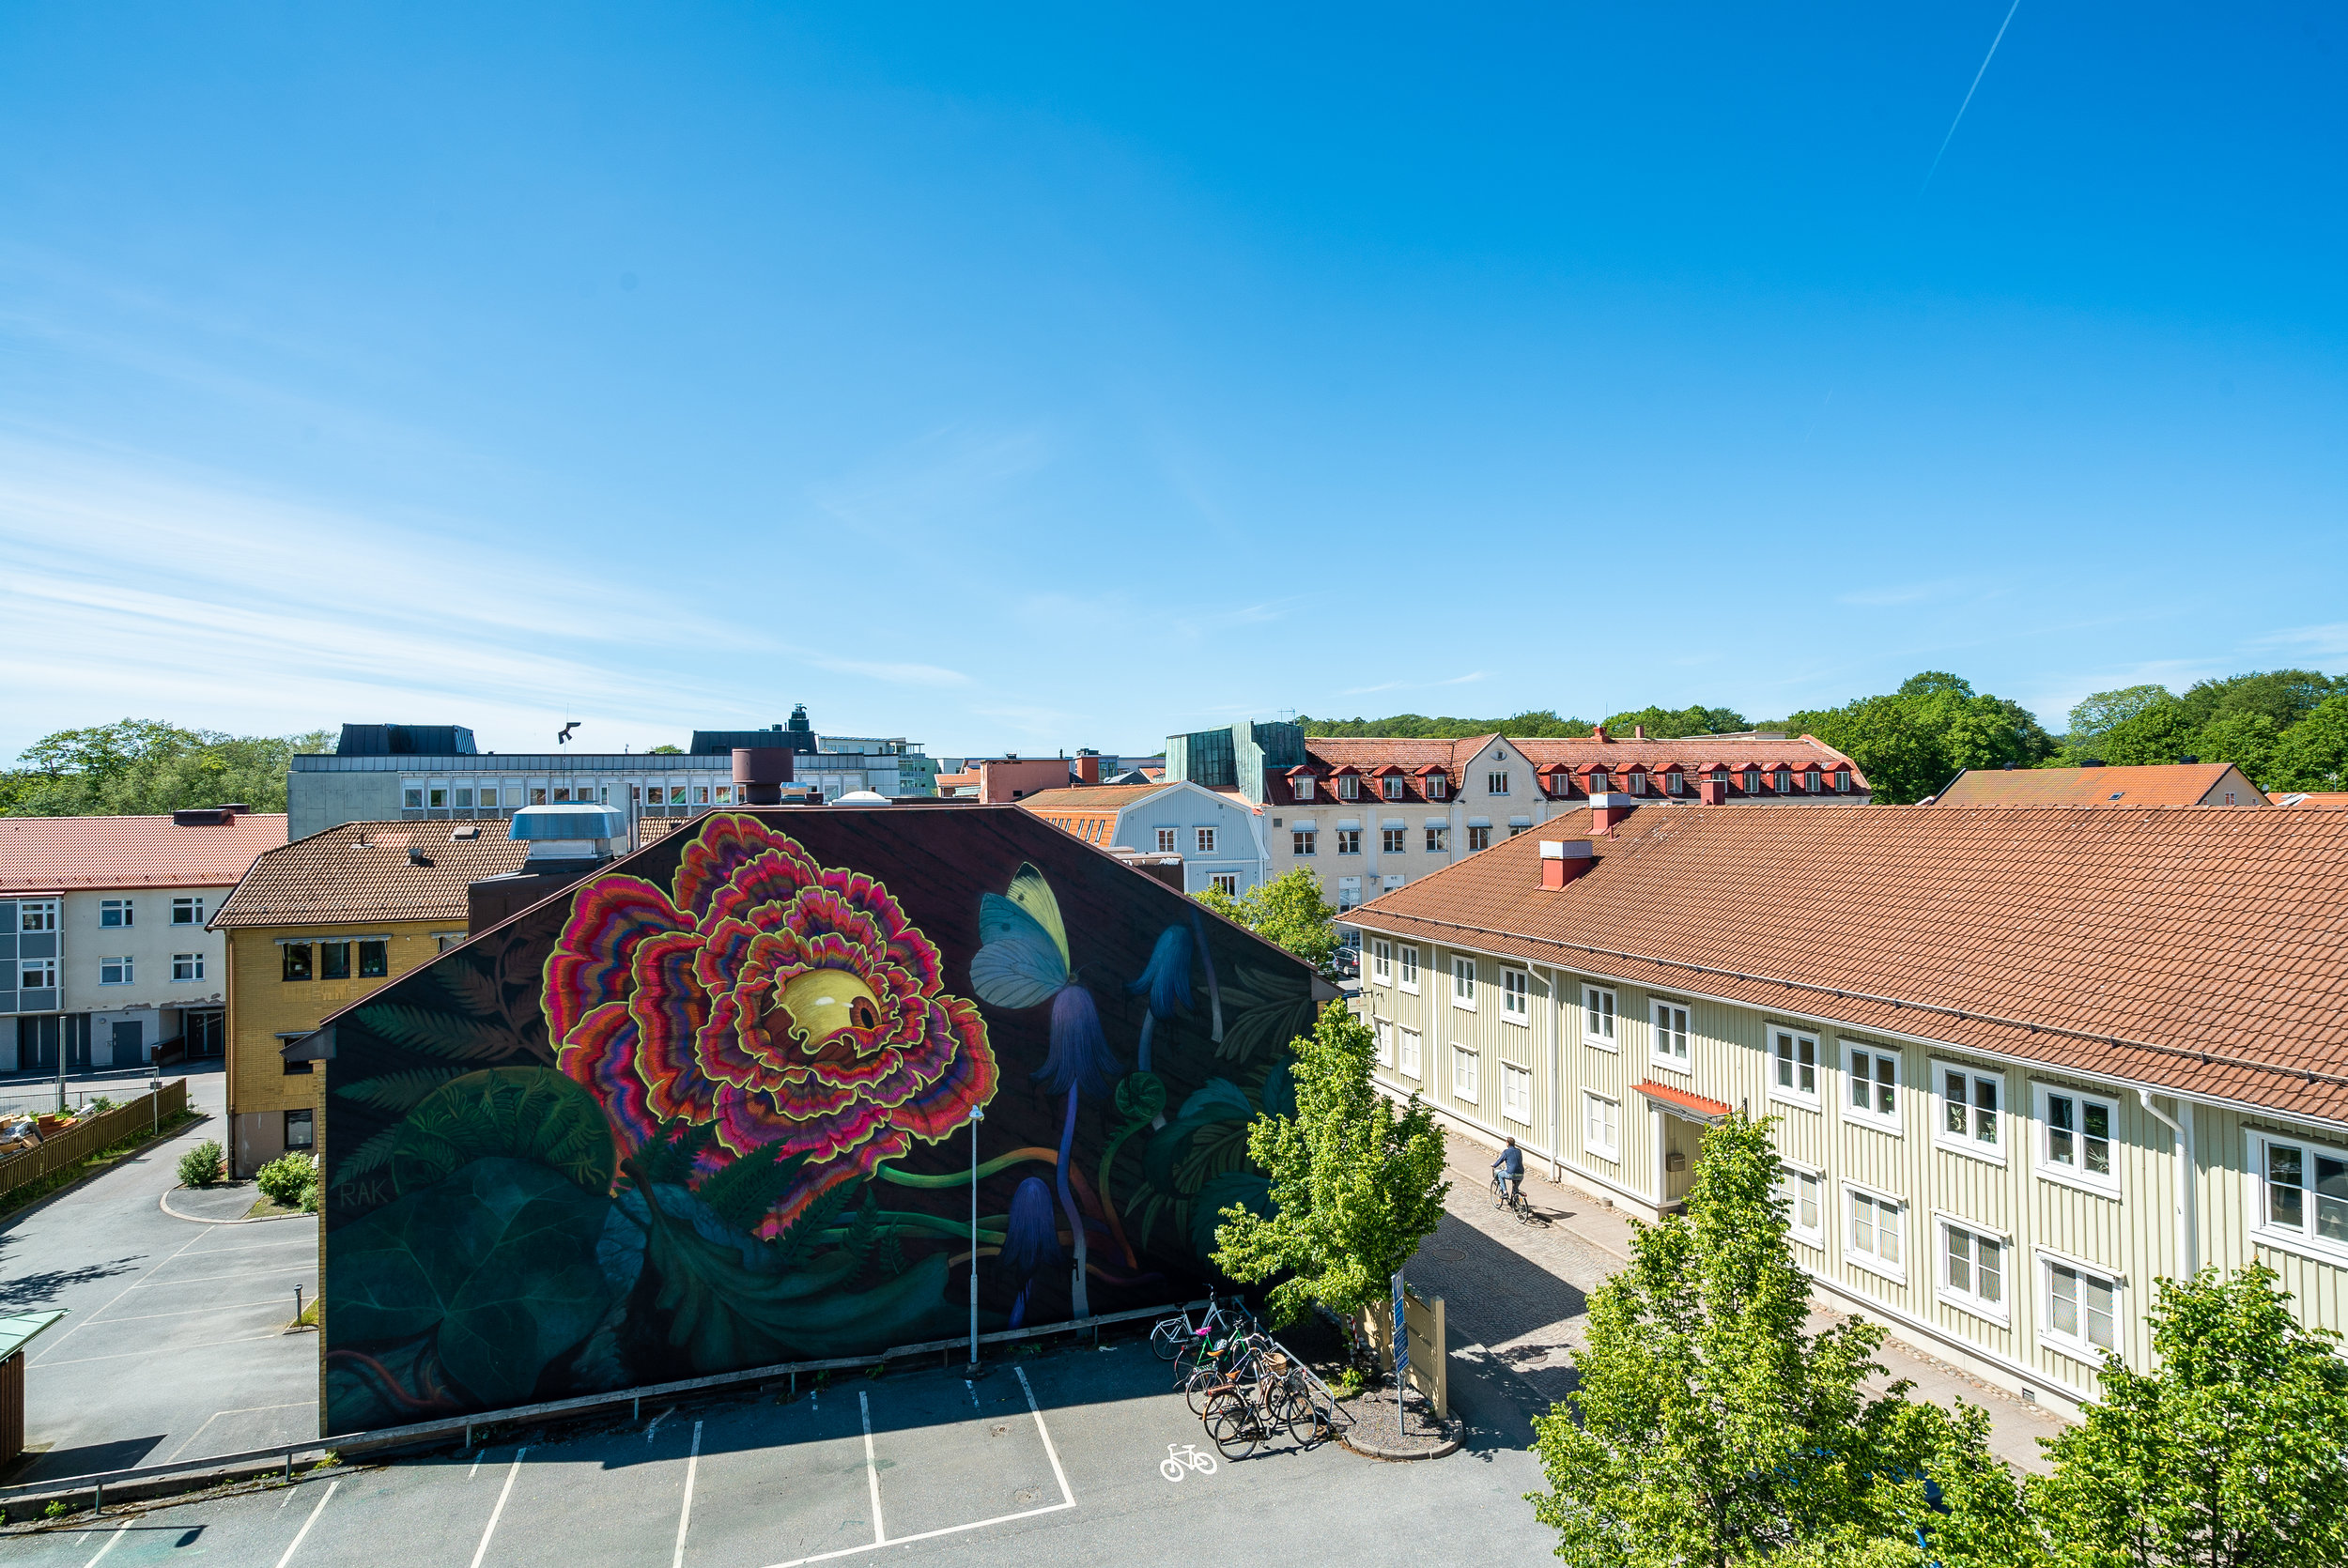 NATALIA_RAK_Artscape_2019-05-31_Fredrik-Åkerberg_4240 x 2832_7.jpg